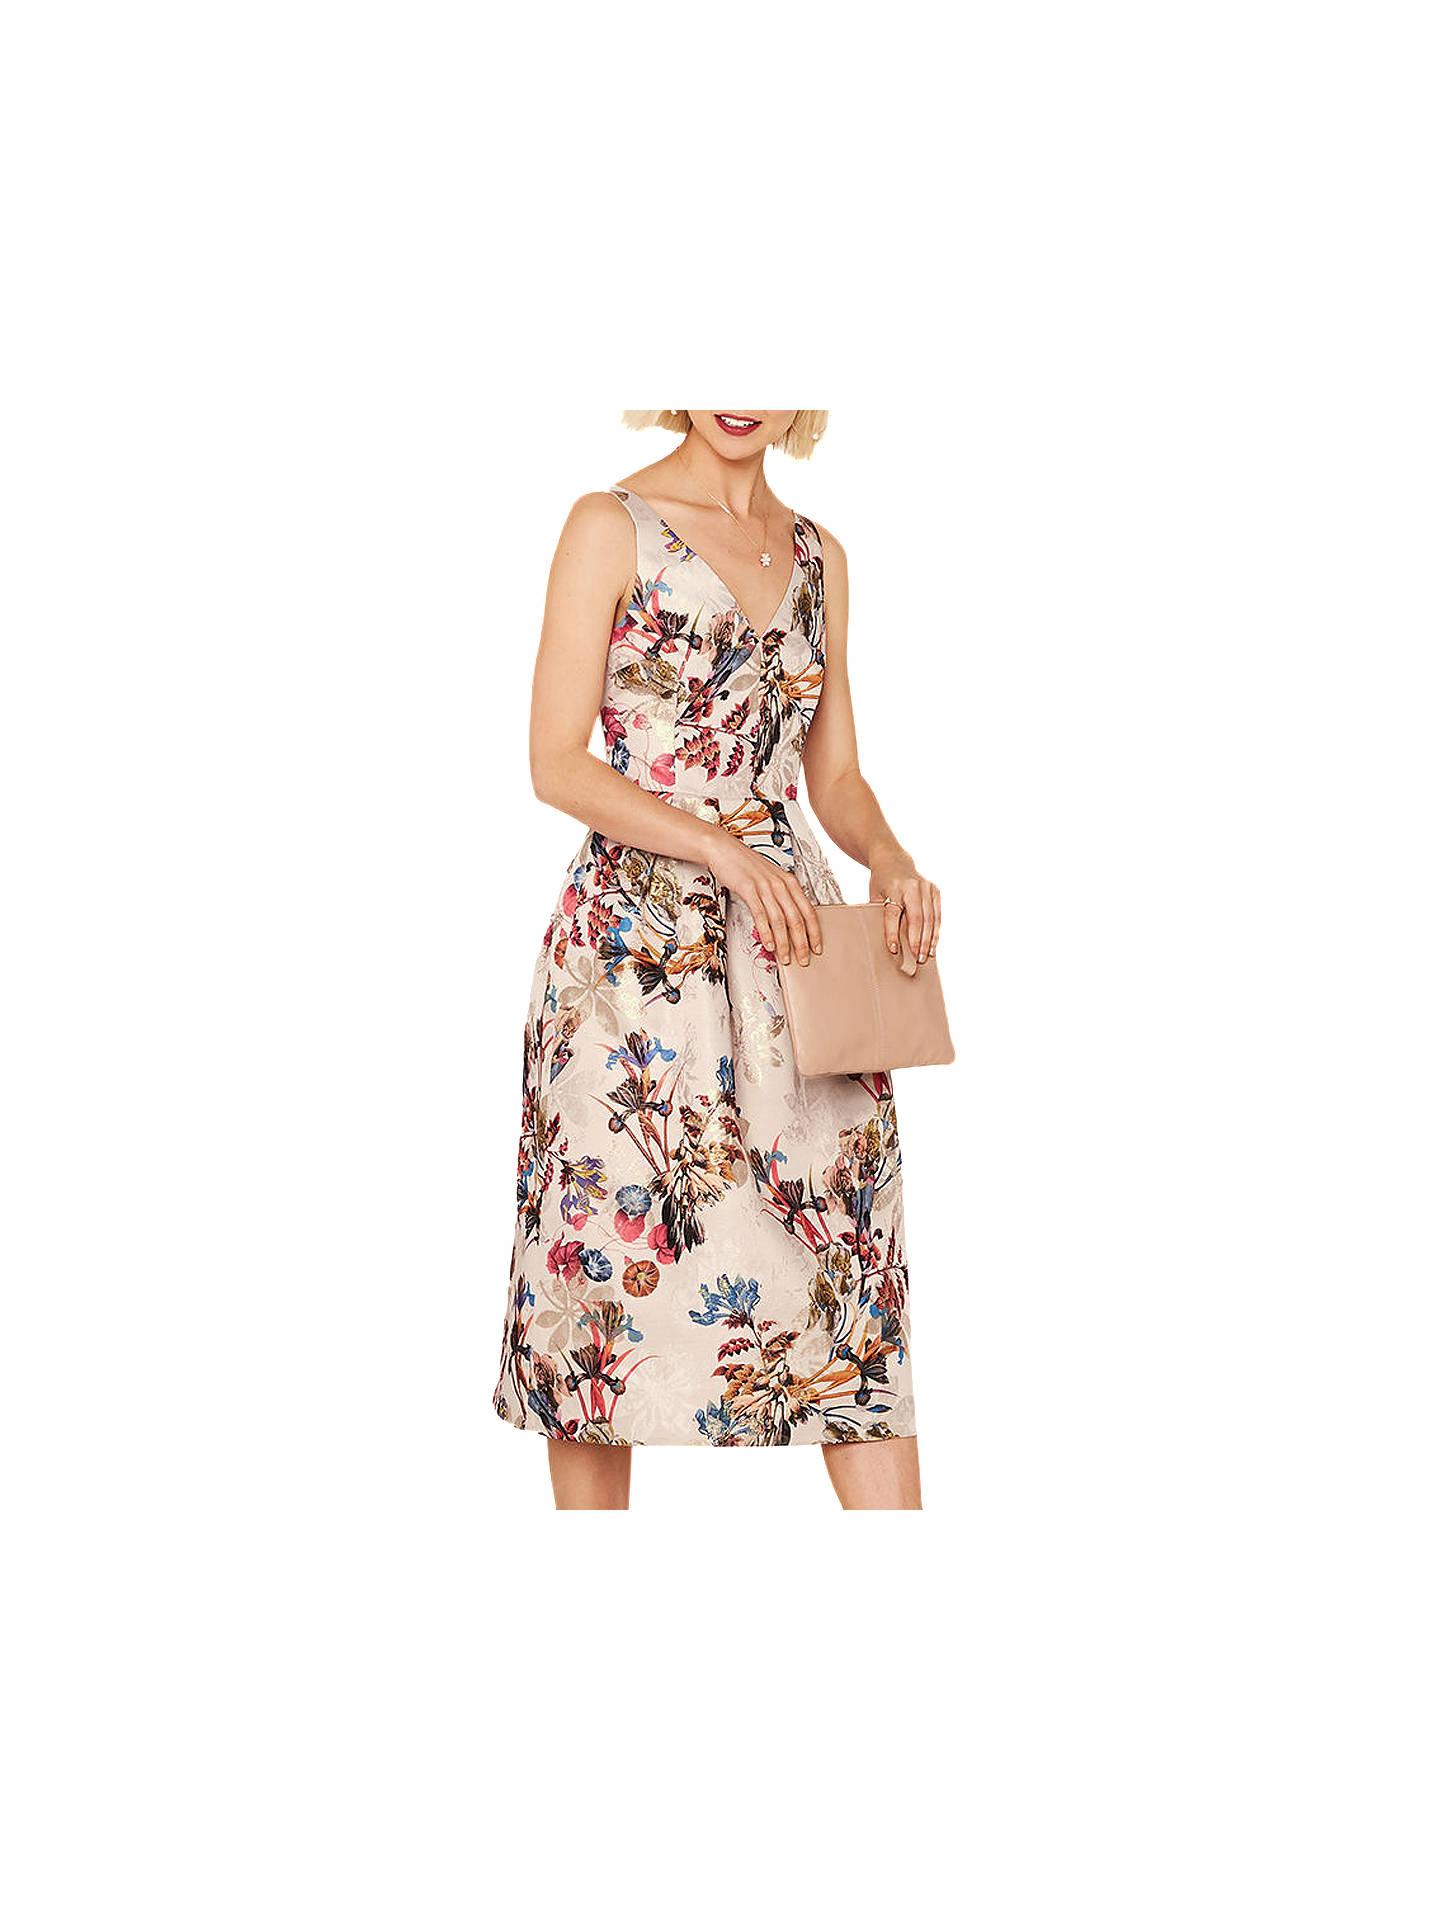 b3e5aec54b2d ... Buy Oasis Floral Iris Jacquard Midi Dress, Multi, 6 Online at  johnlewis.com ...